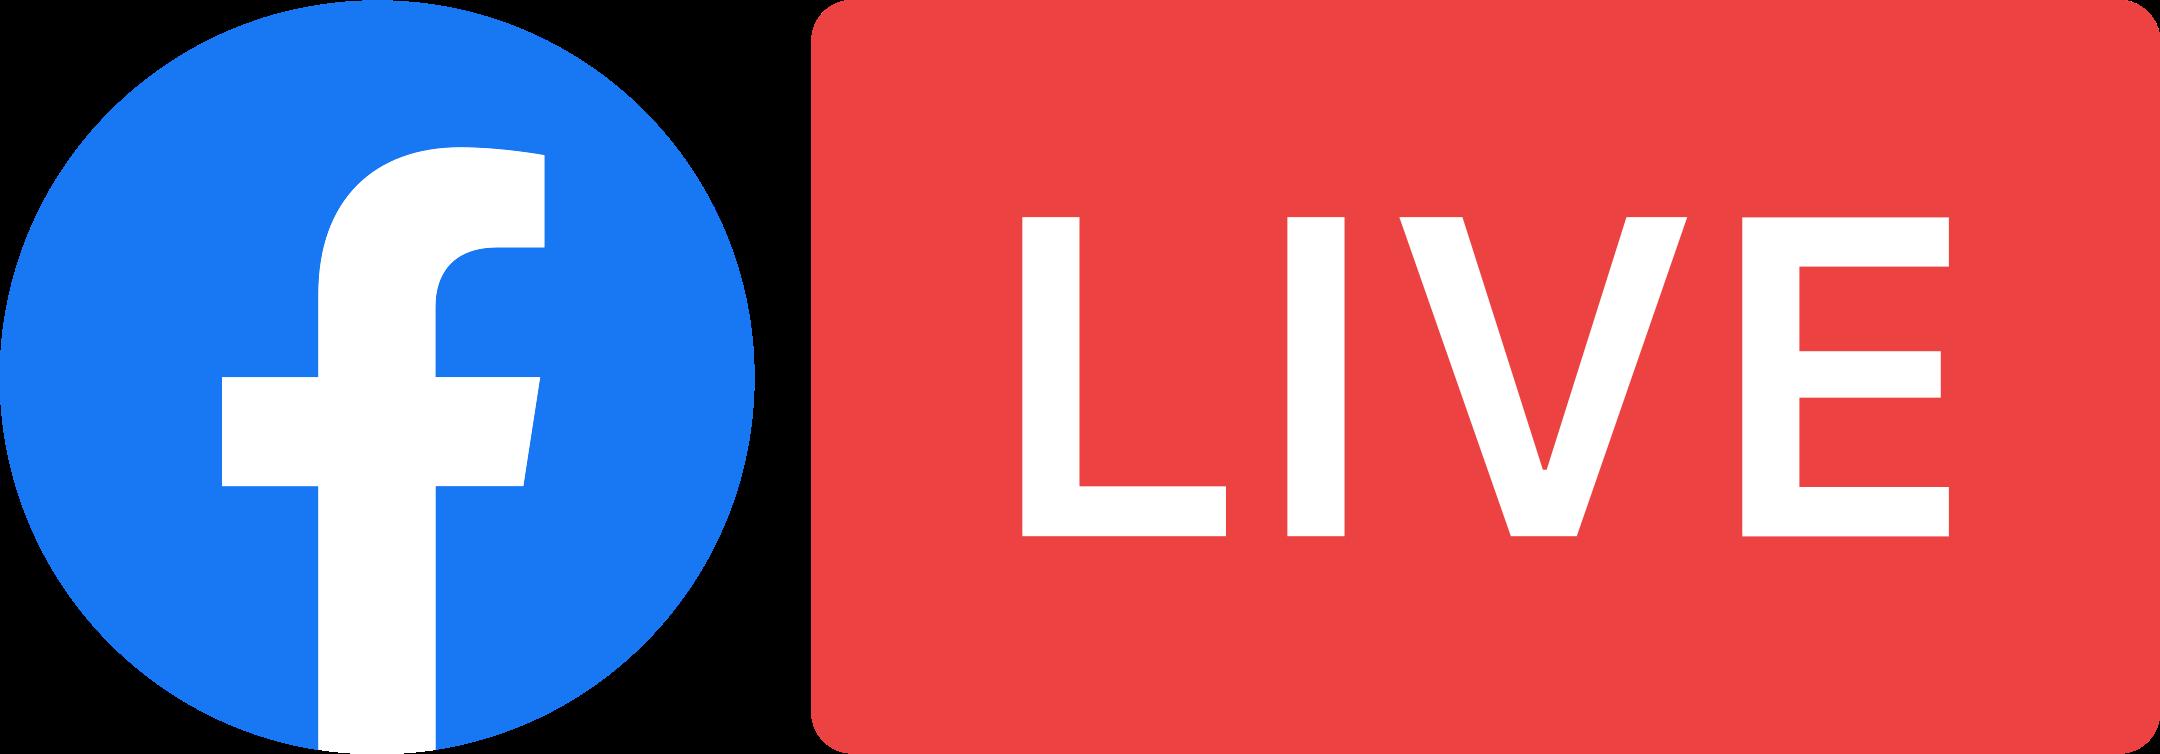 facebook live logo 1 - Facebook Live Logo